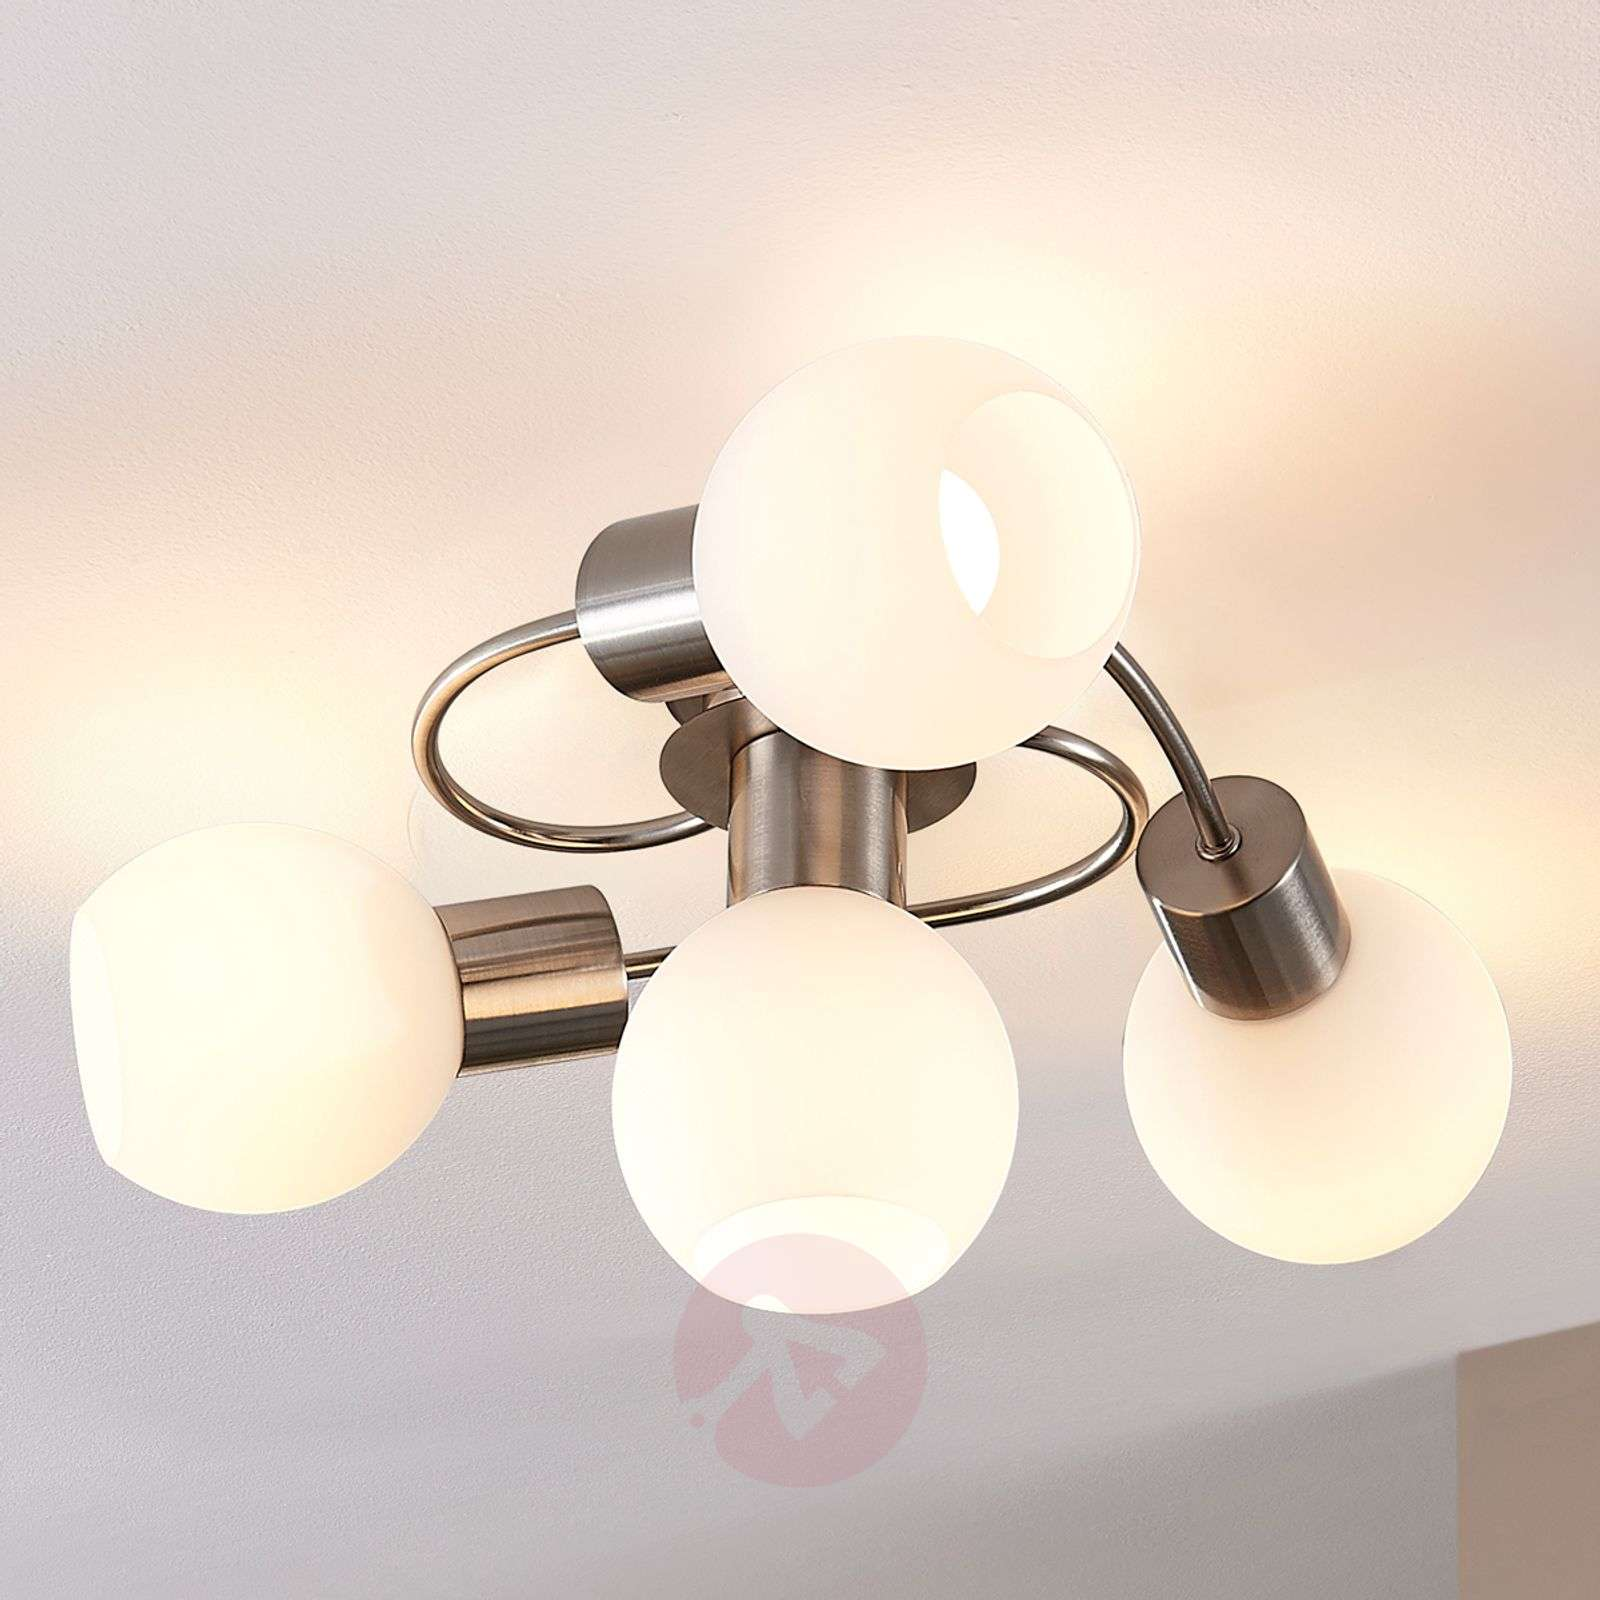 Kaunis Ciala LED-kattovalaisin-9621009-02